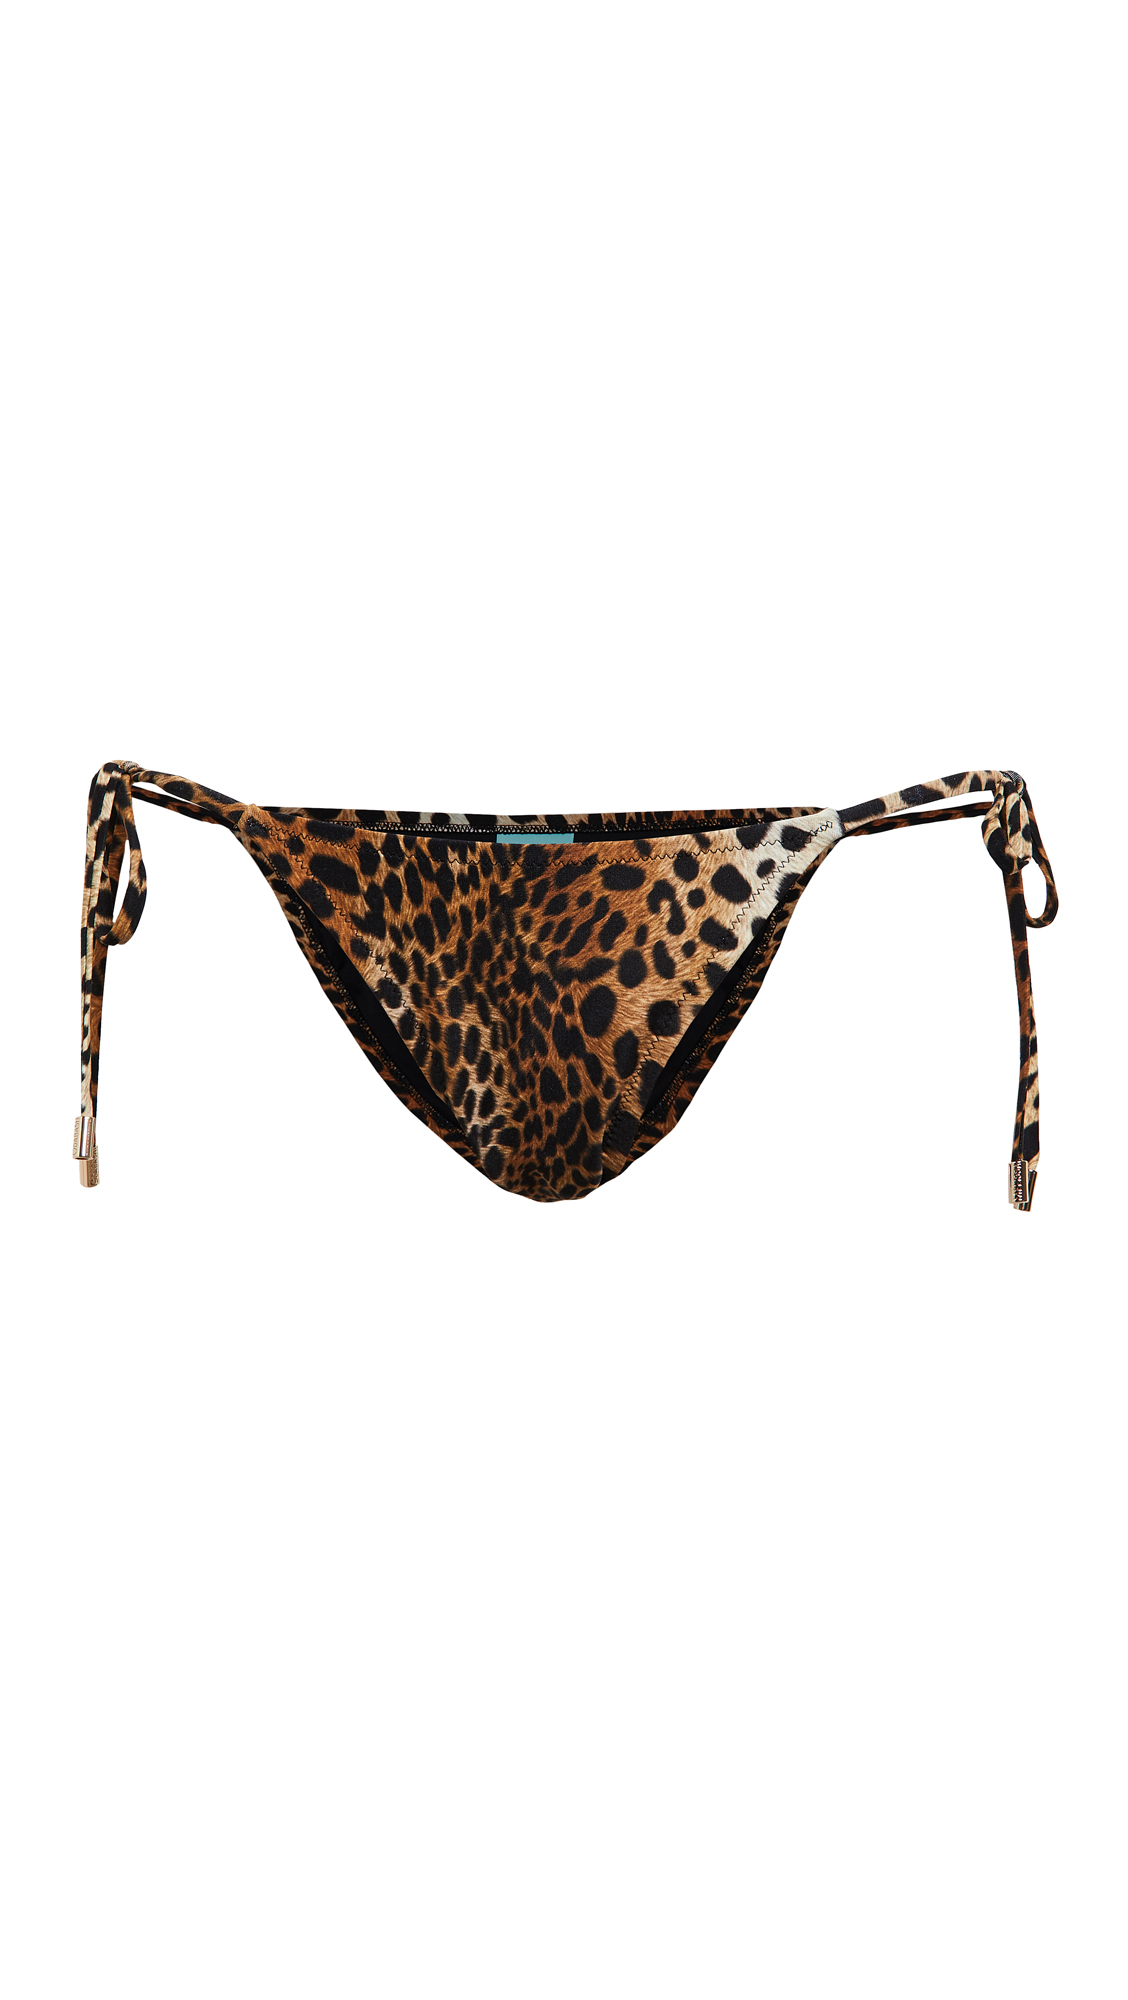 Melissa Odabash Miami Bikini Bottoms